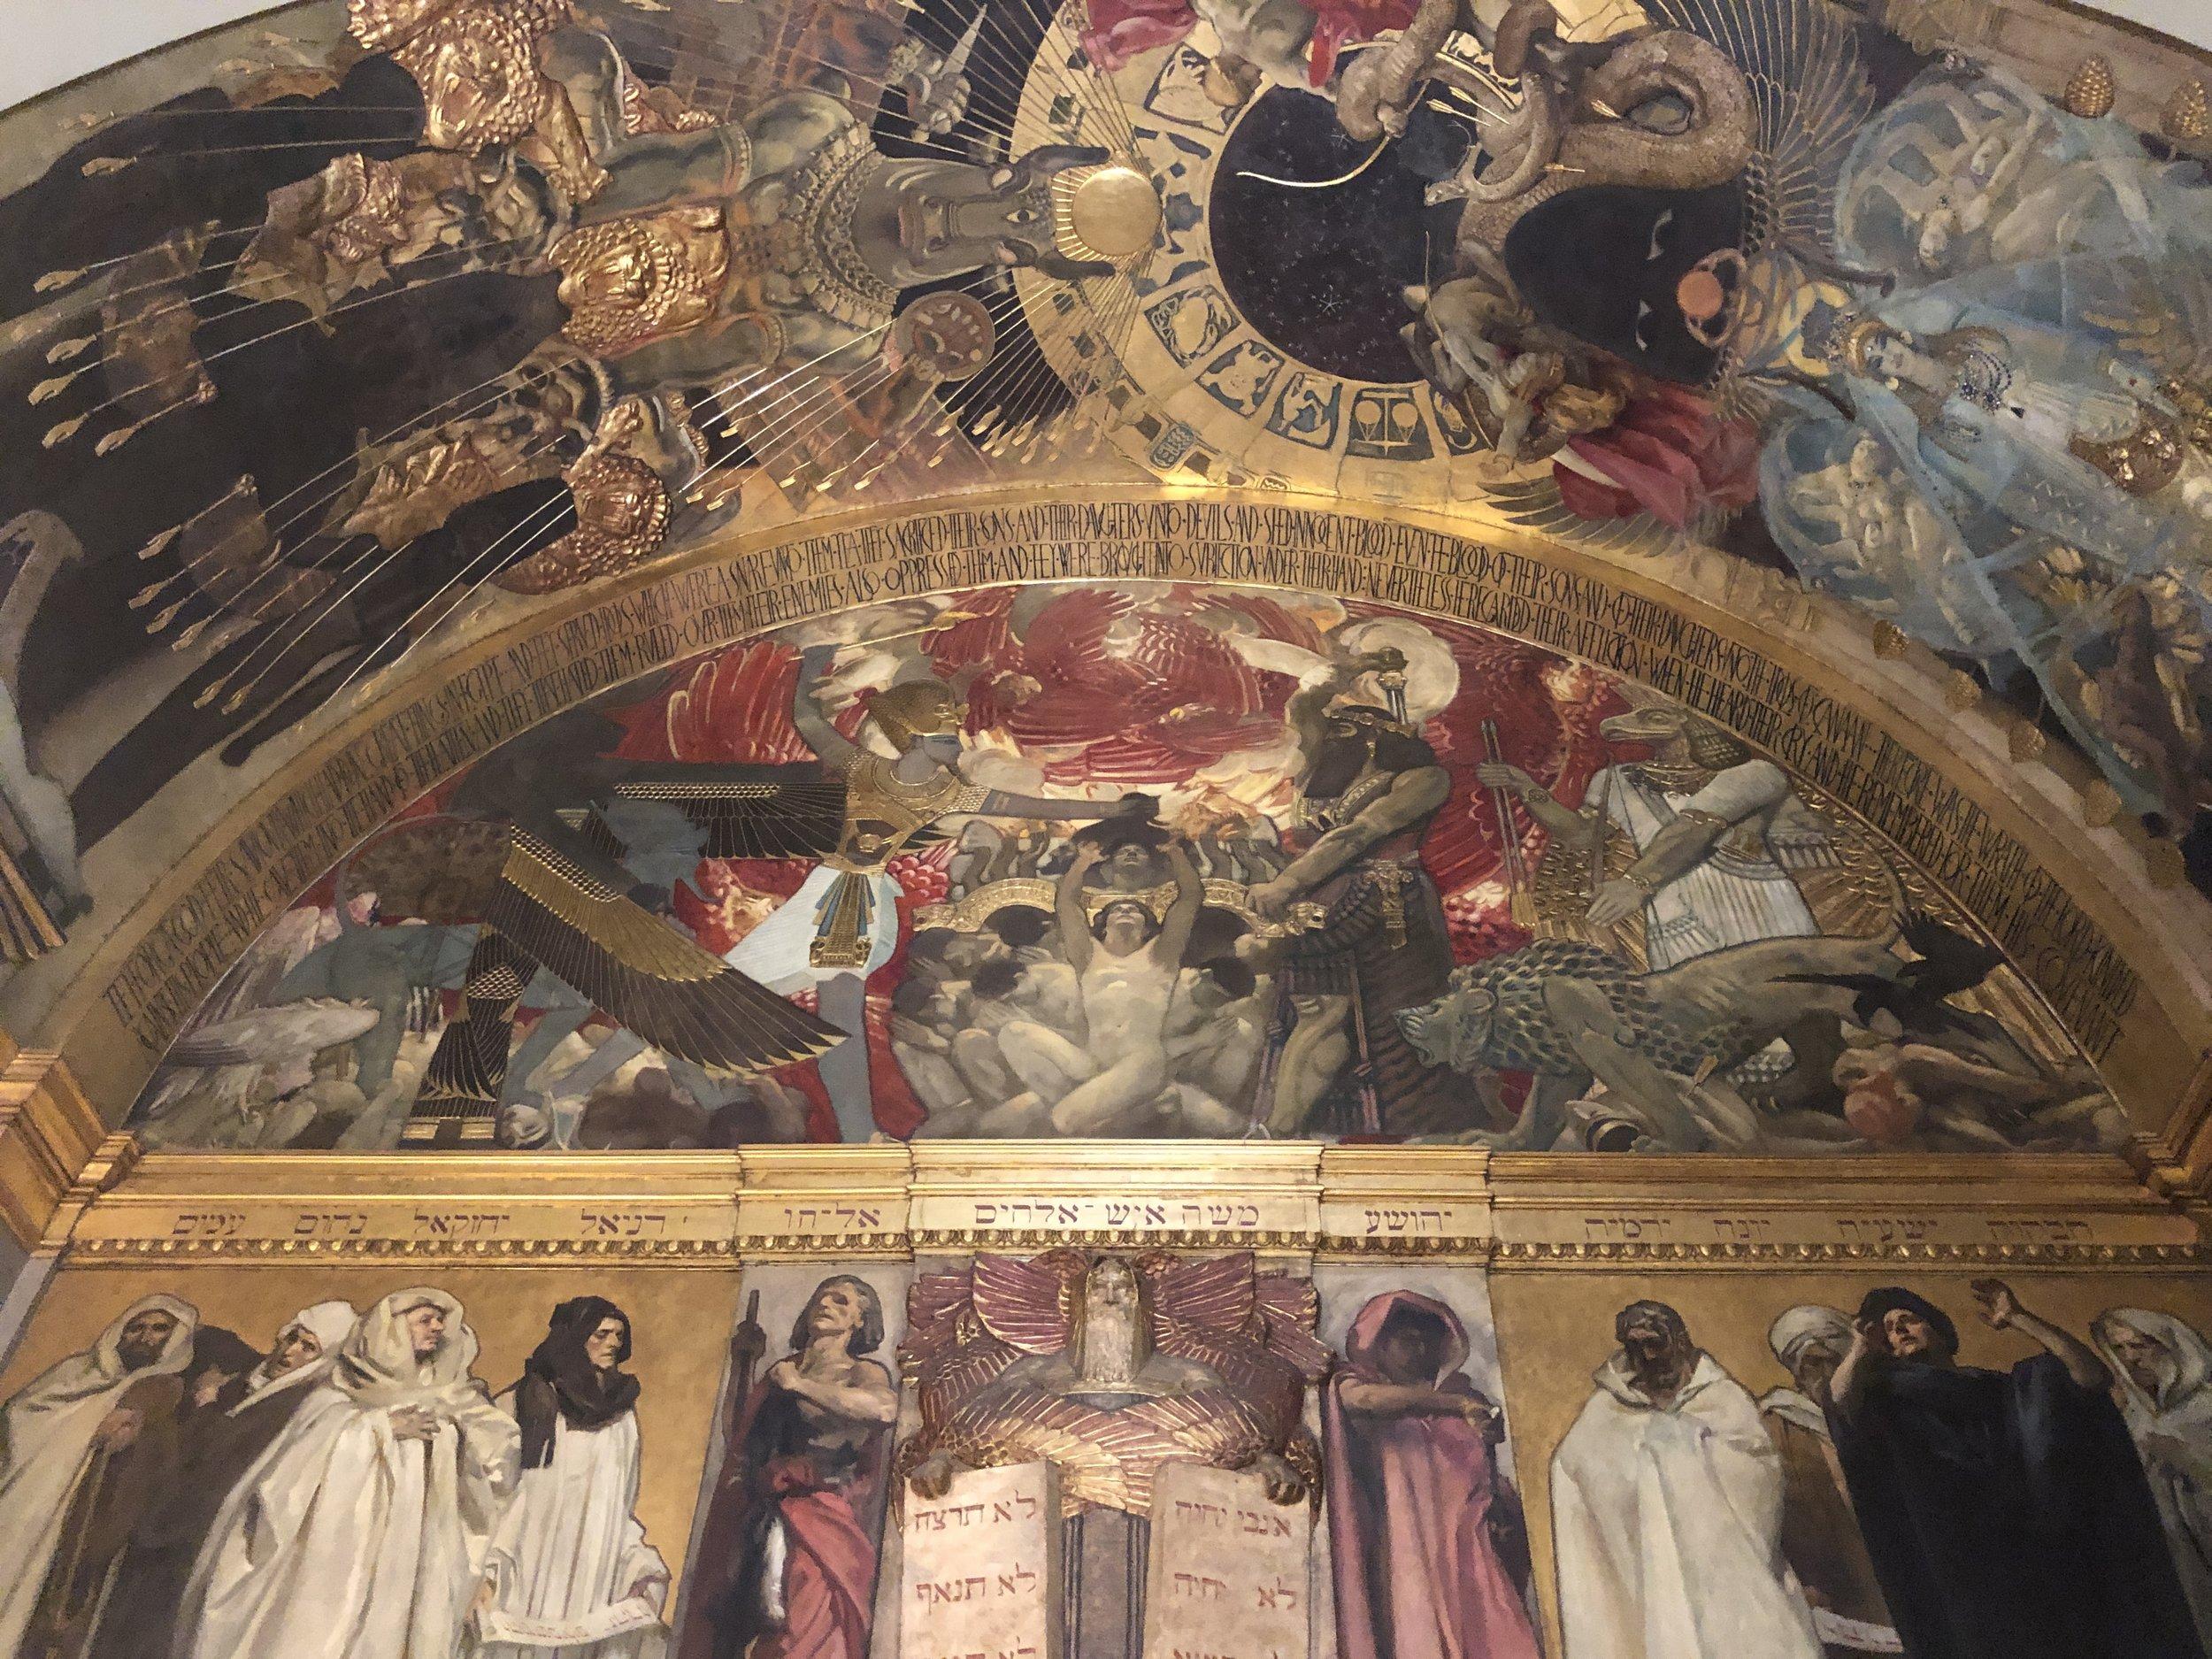 The John Singer Sargent Murals